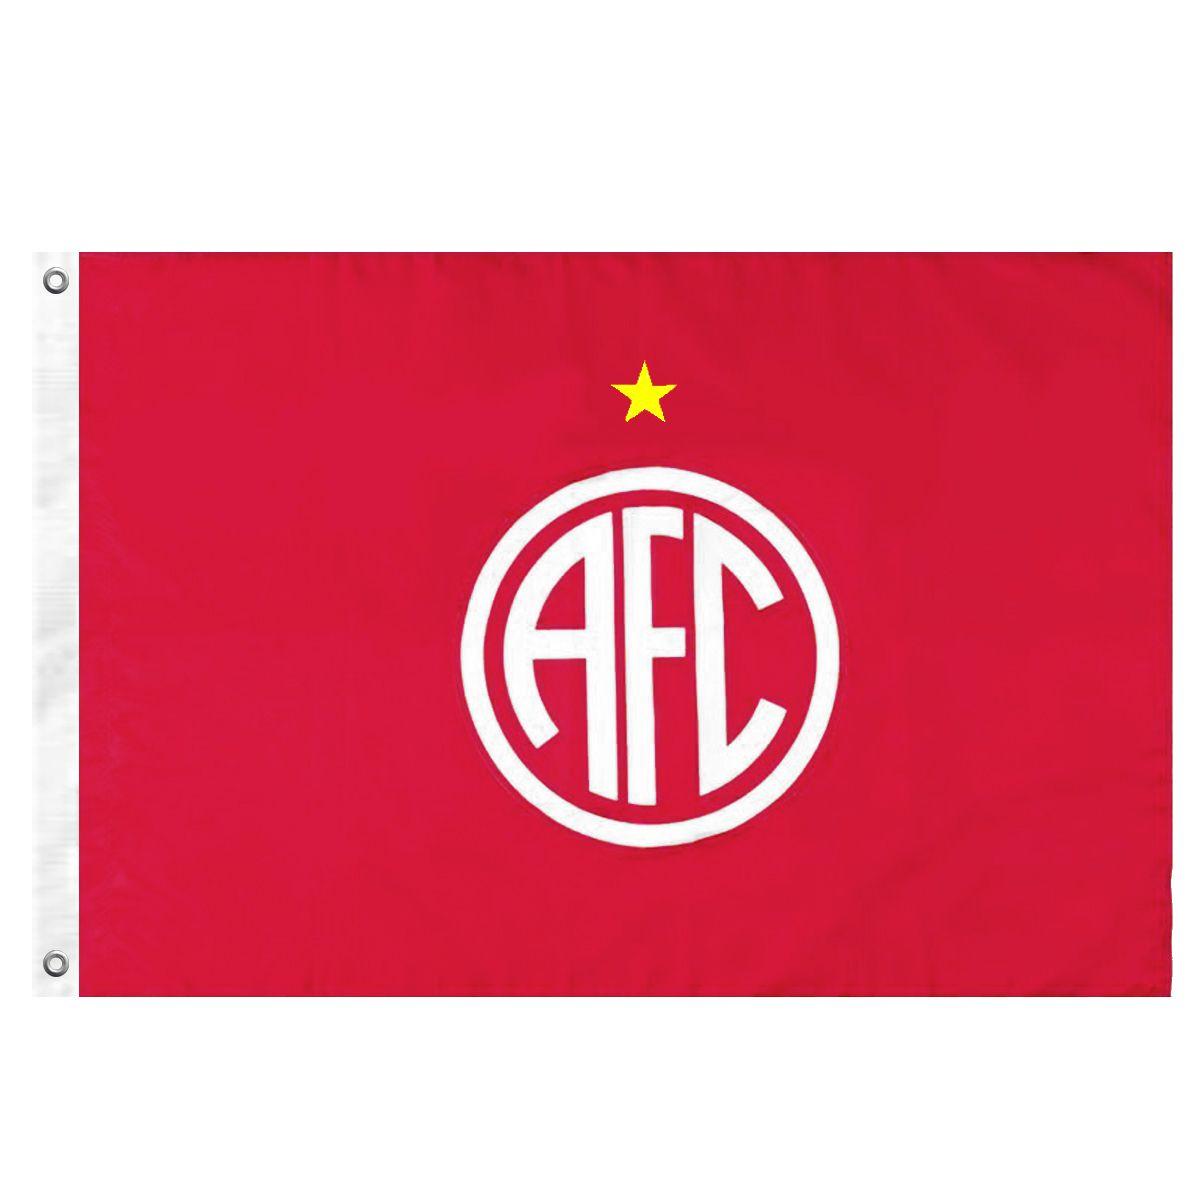 Bandeira Oficial do América RJ 96 x 68 cm - 1 1/2 pano